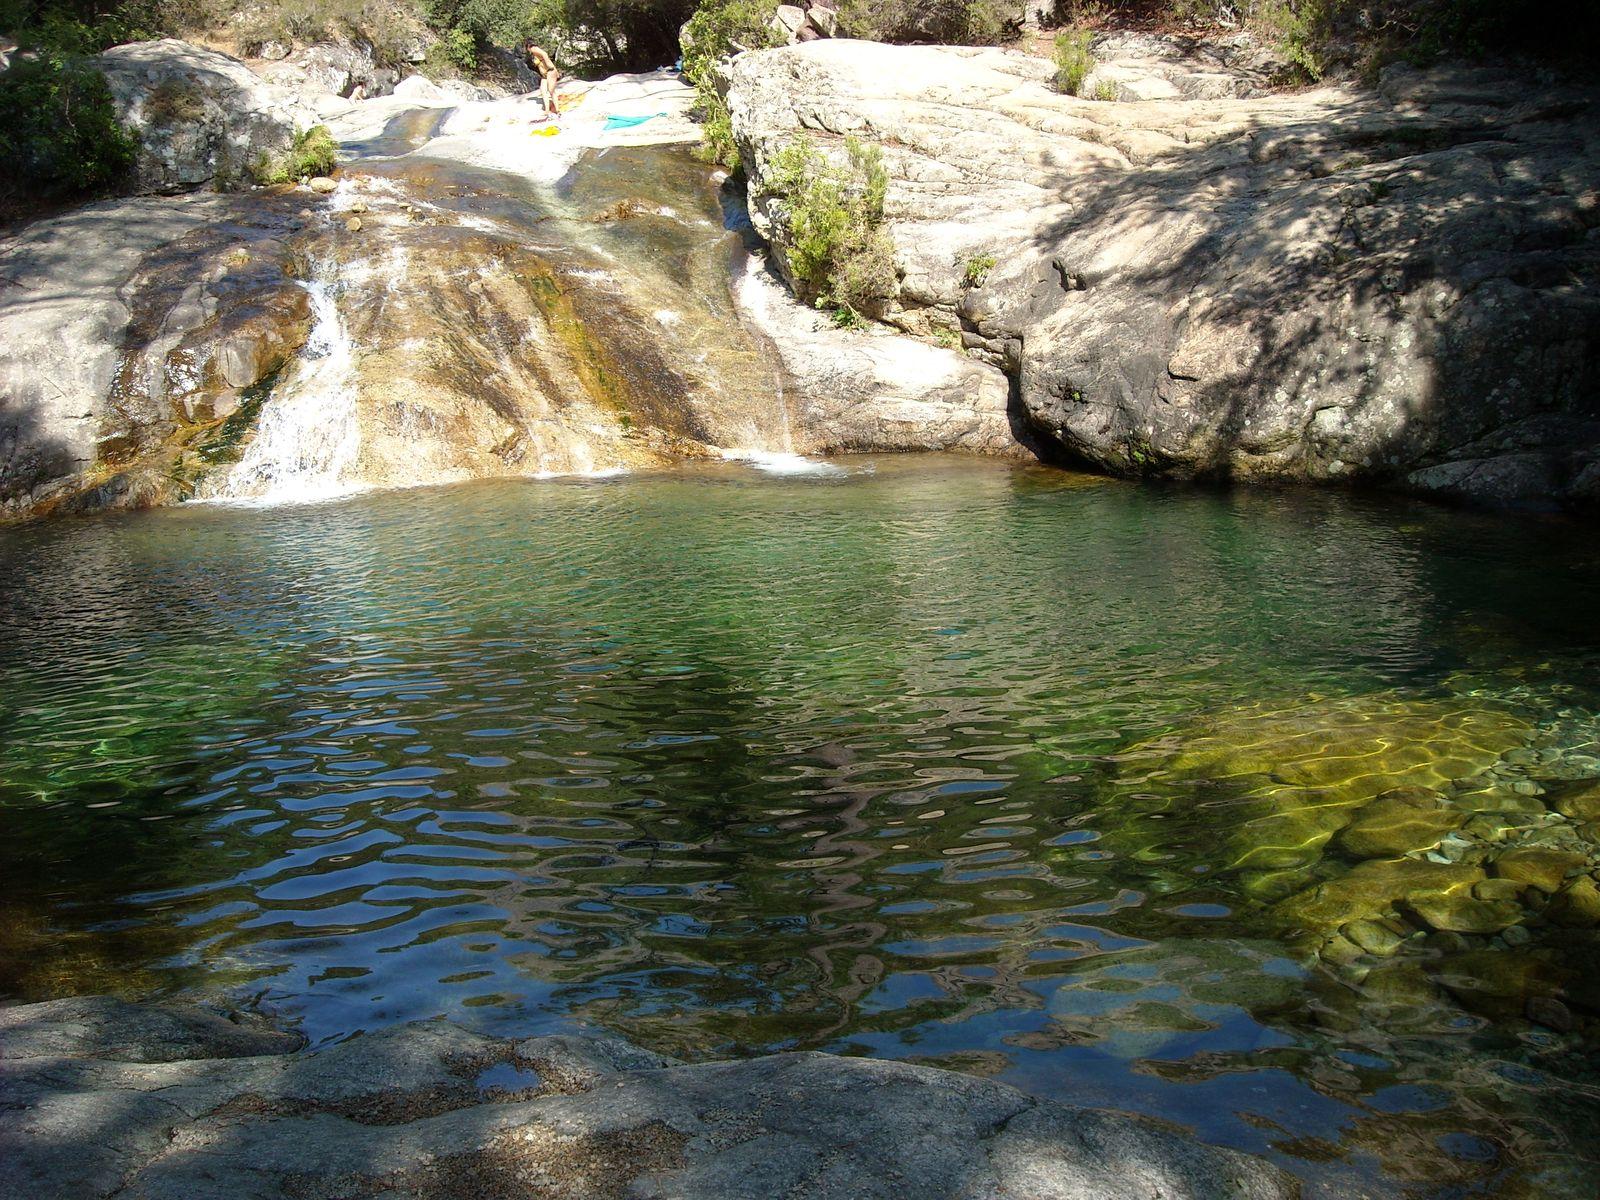 2009 corse blog d 39 un old school geek for Col de bavella piscine naturelle